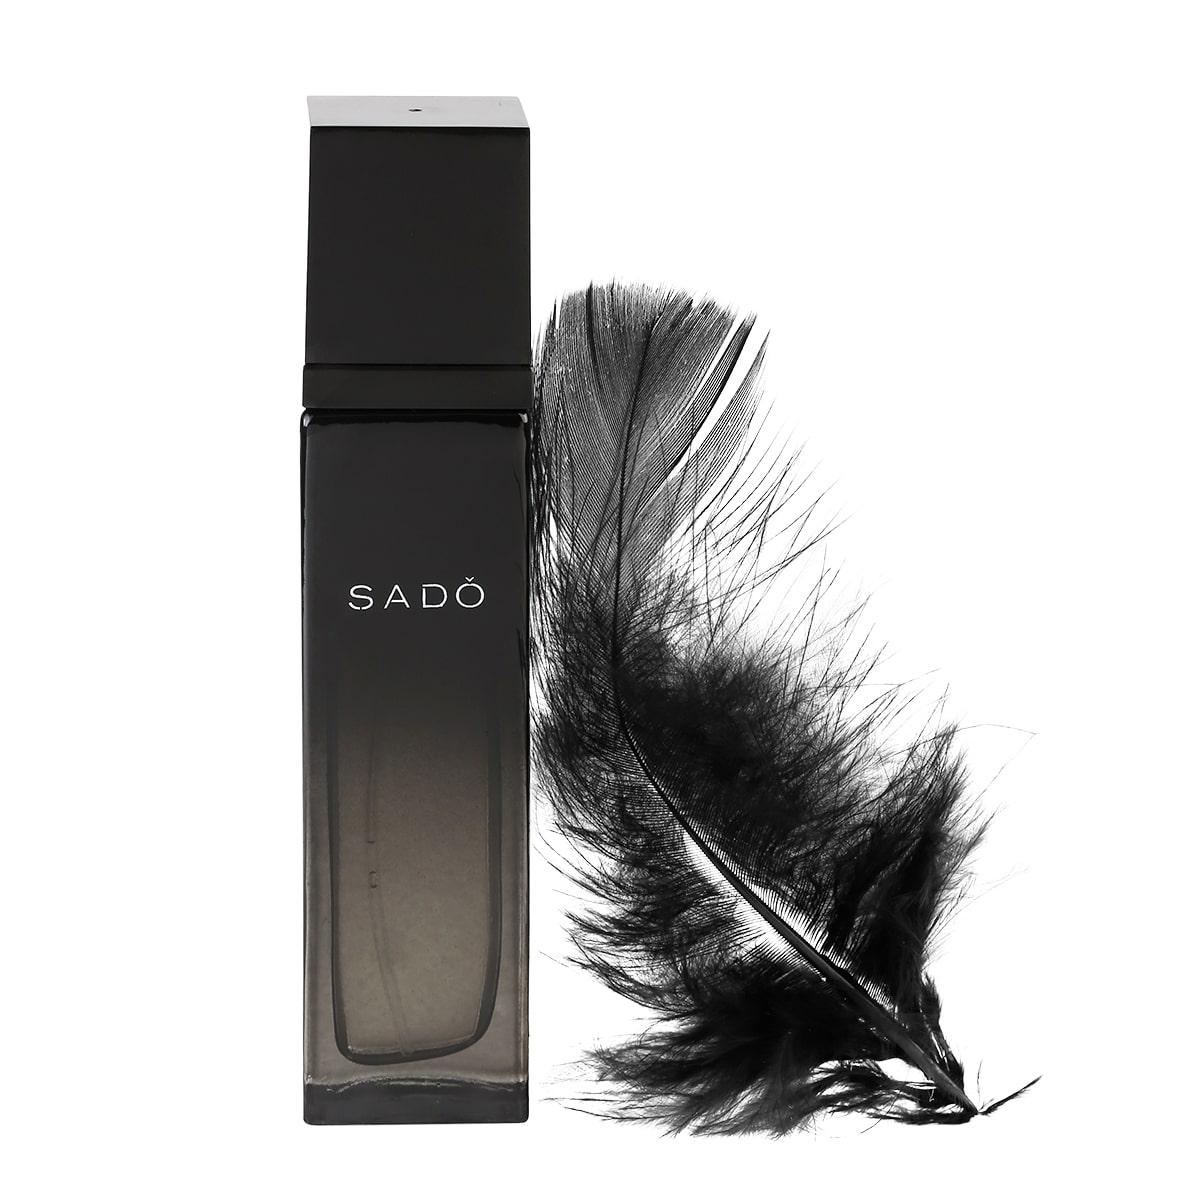 Sadô Perfume Afrodisíaco - 30ml